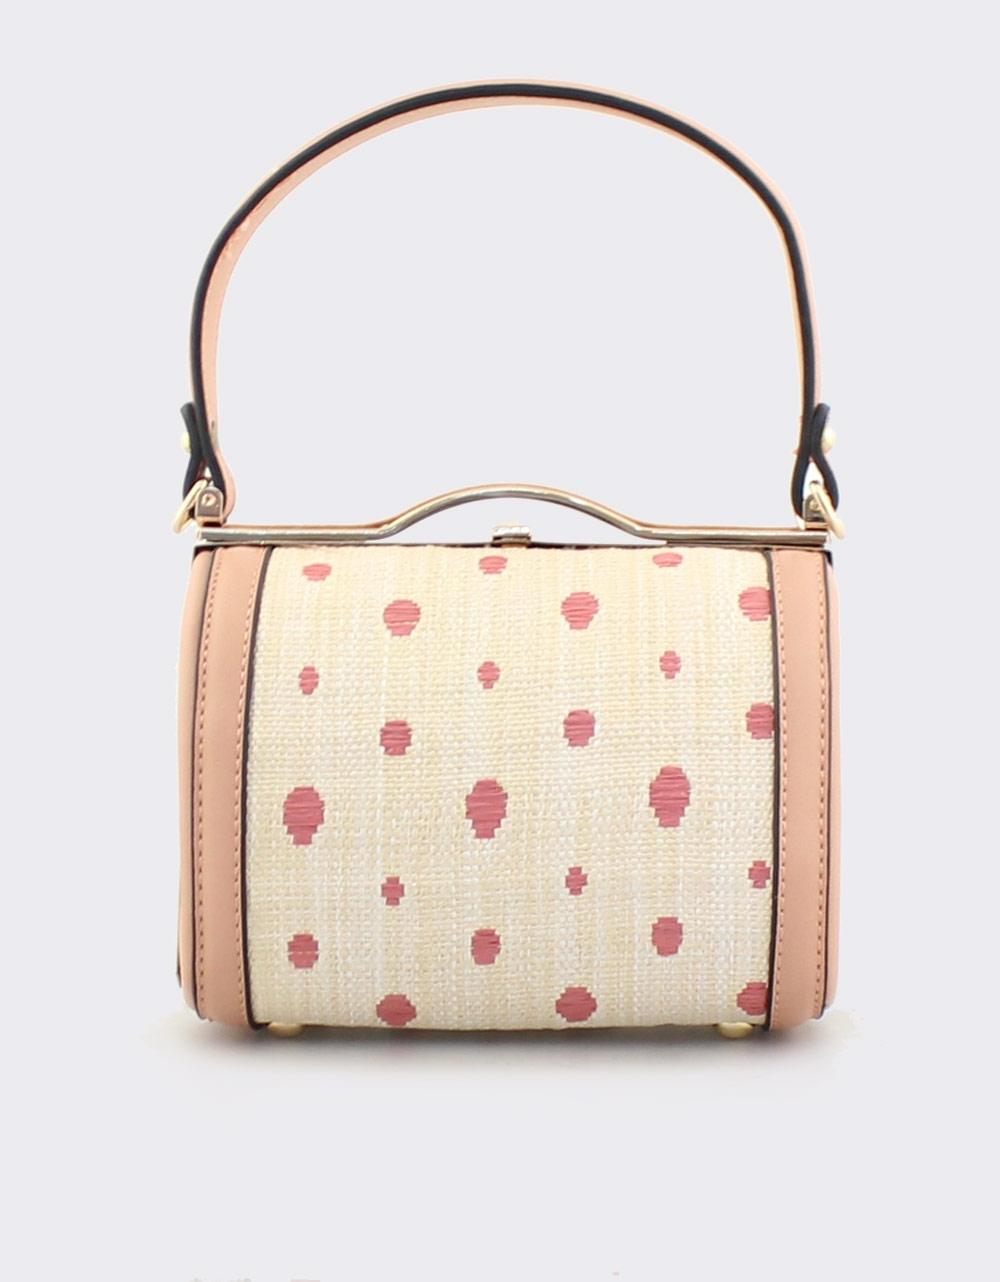 2abe01472a Εικόνα από Γυναικείες τσάντες χειρός με πουά μοτίβο Ροζ